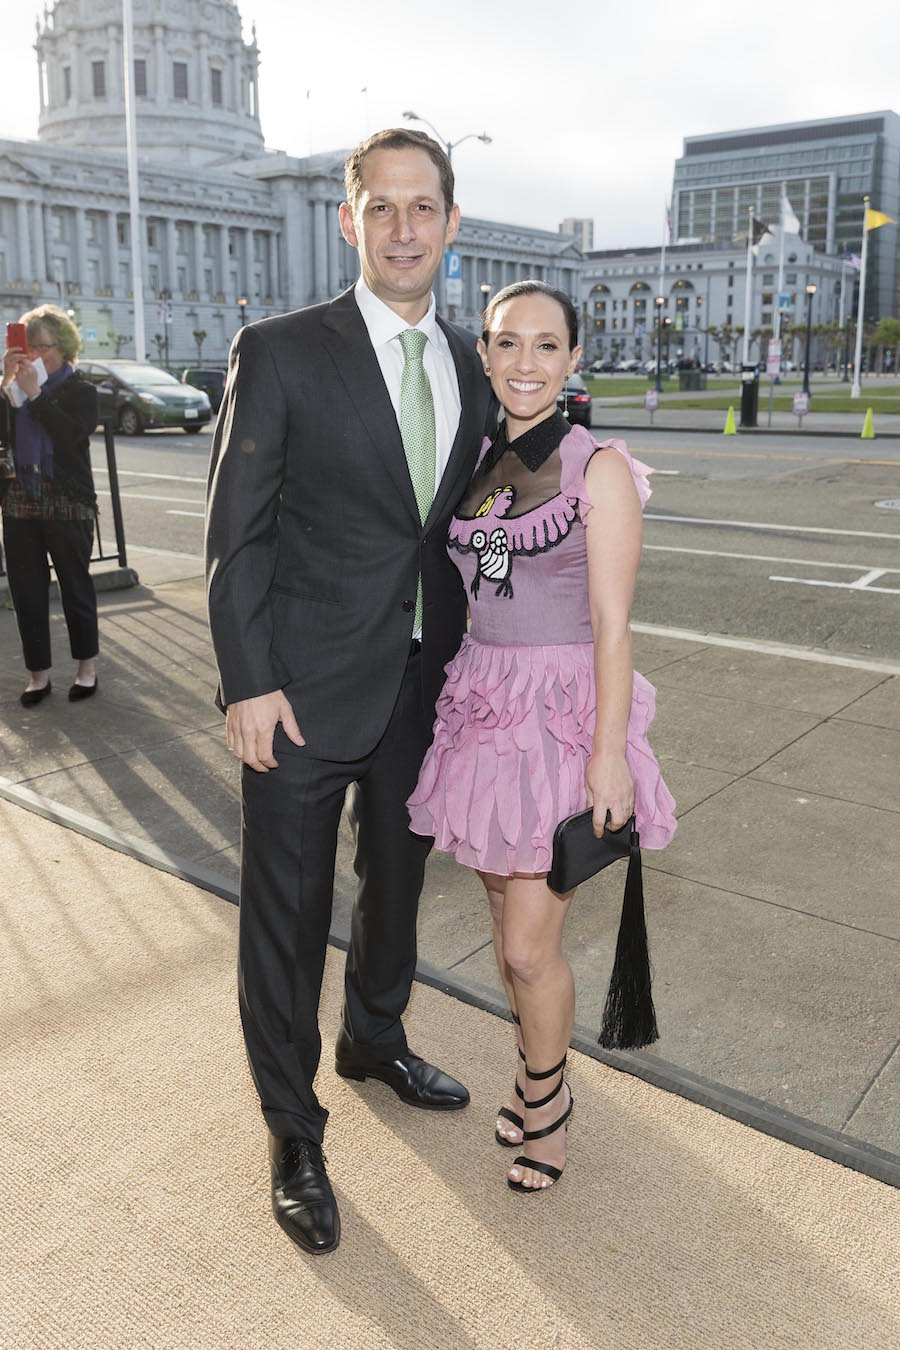 Daniel Lurie and Becca Prowda